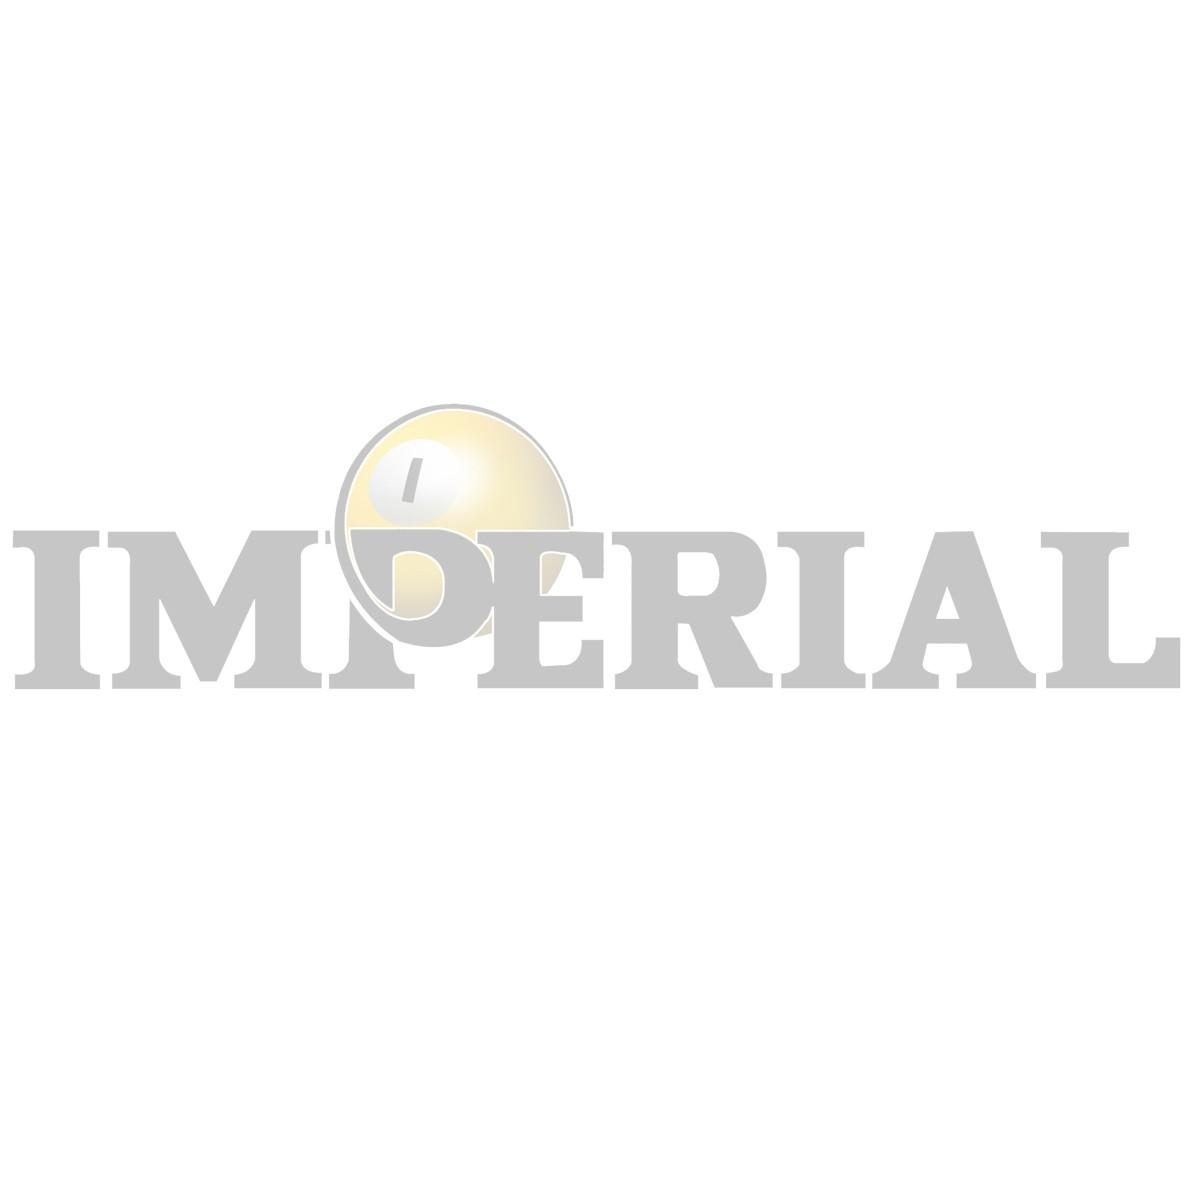 Los Angeles Dodgers Home vs. Away Billiard Ball Set